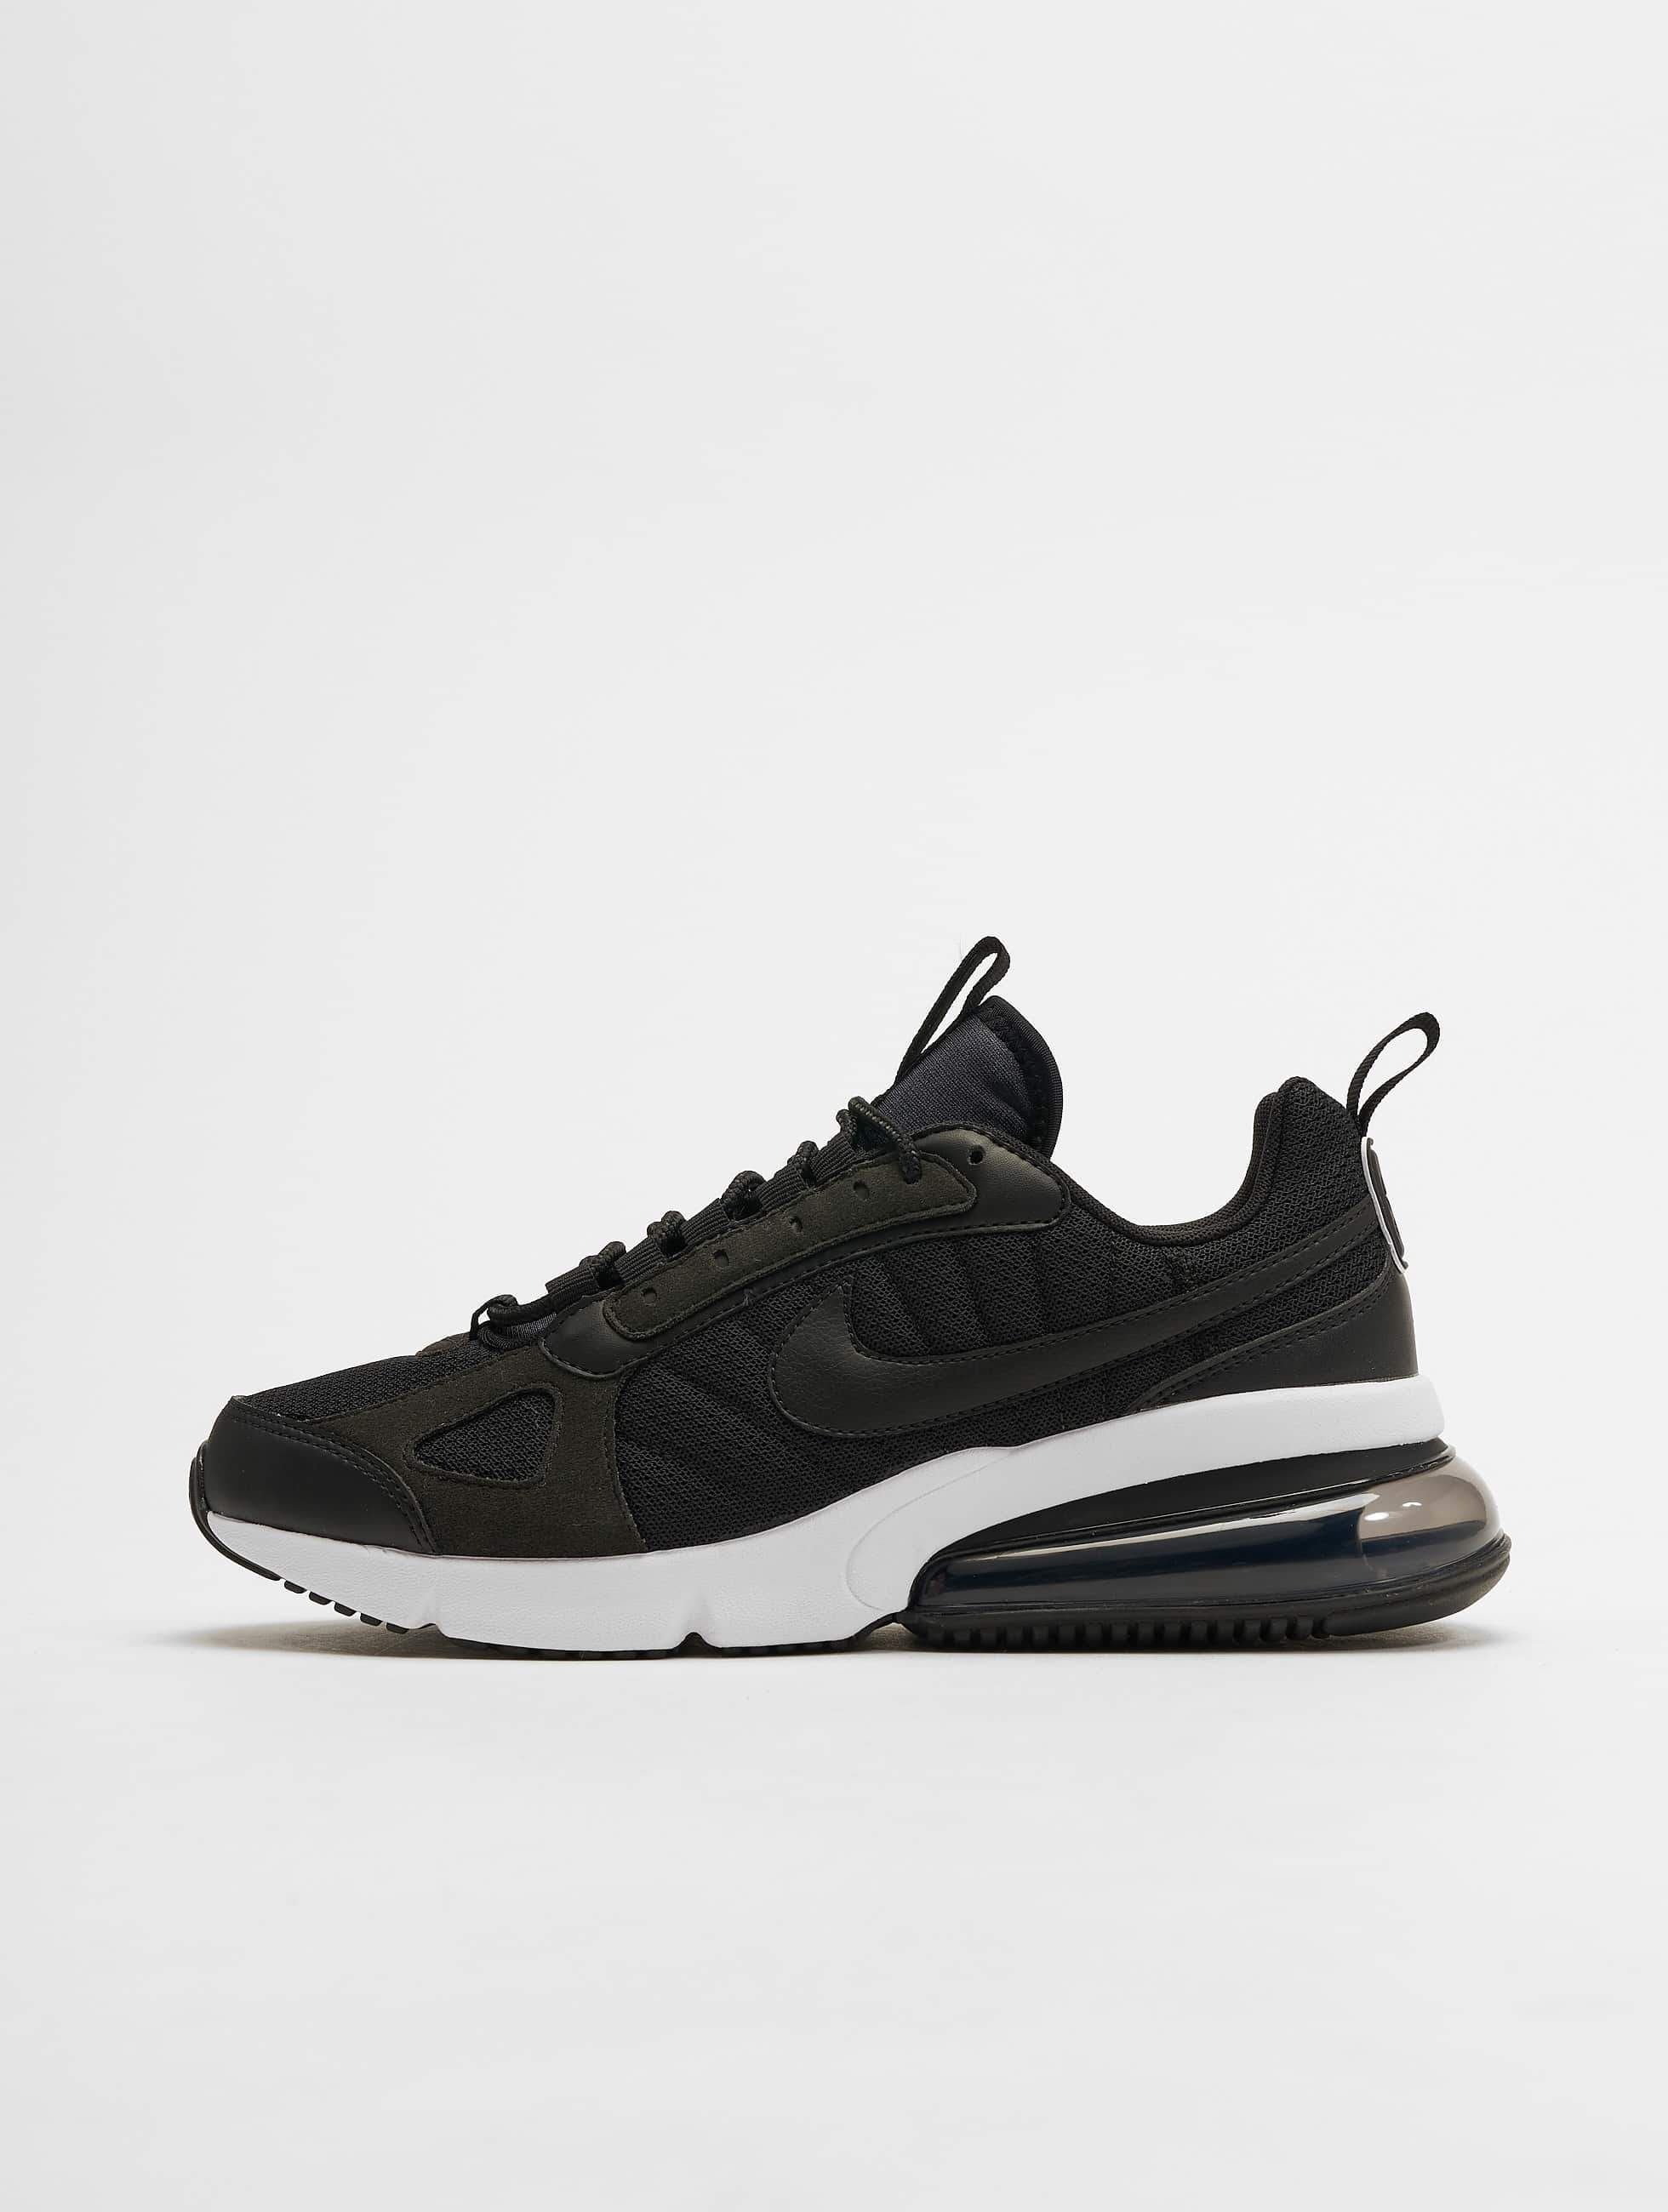 Nike Air Max 270 Futura Sneakers BlackBlackWhite